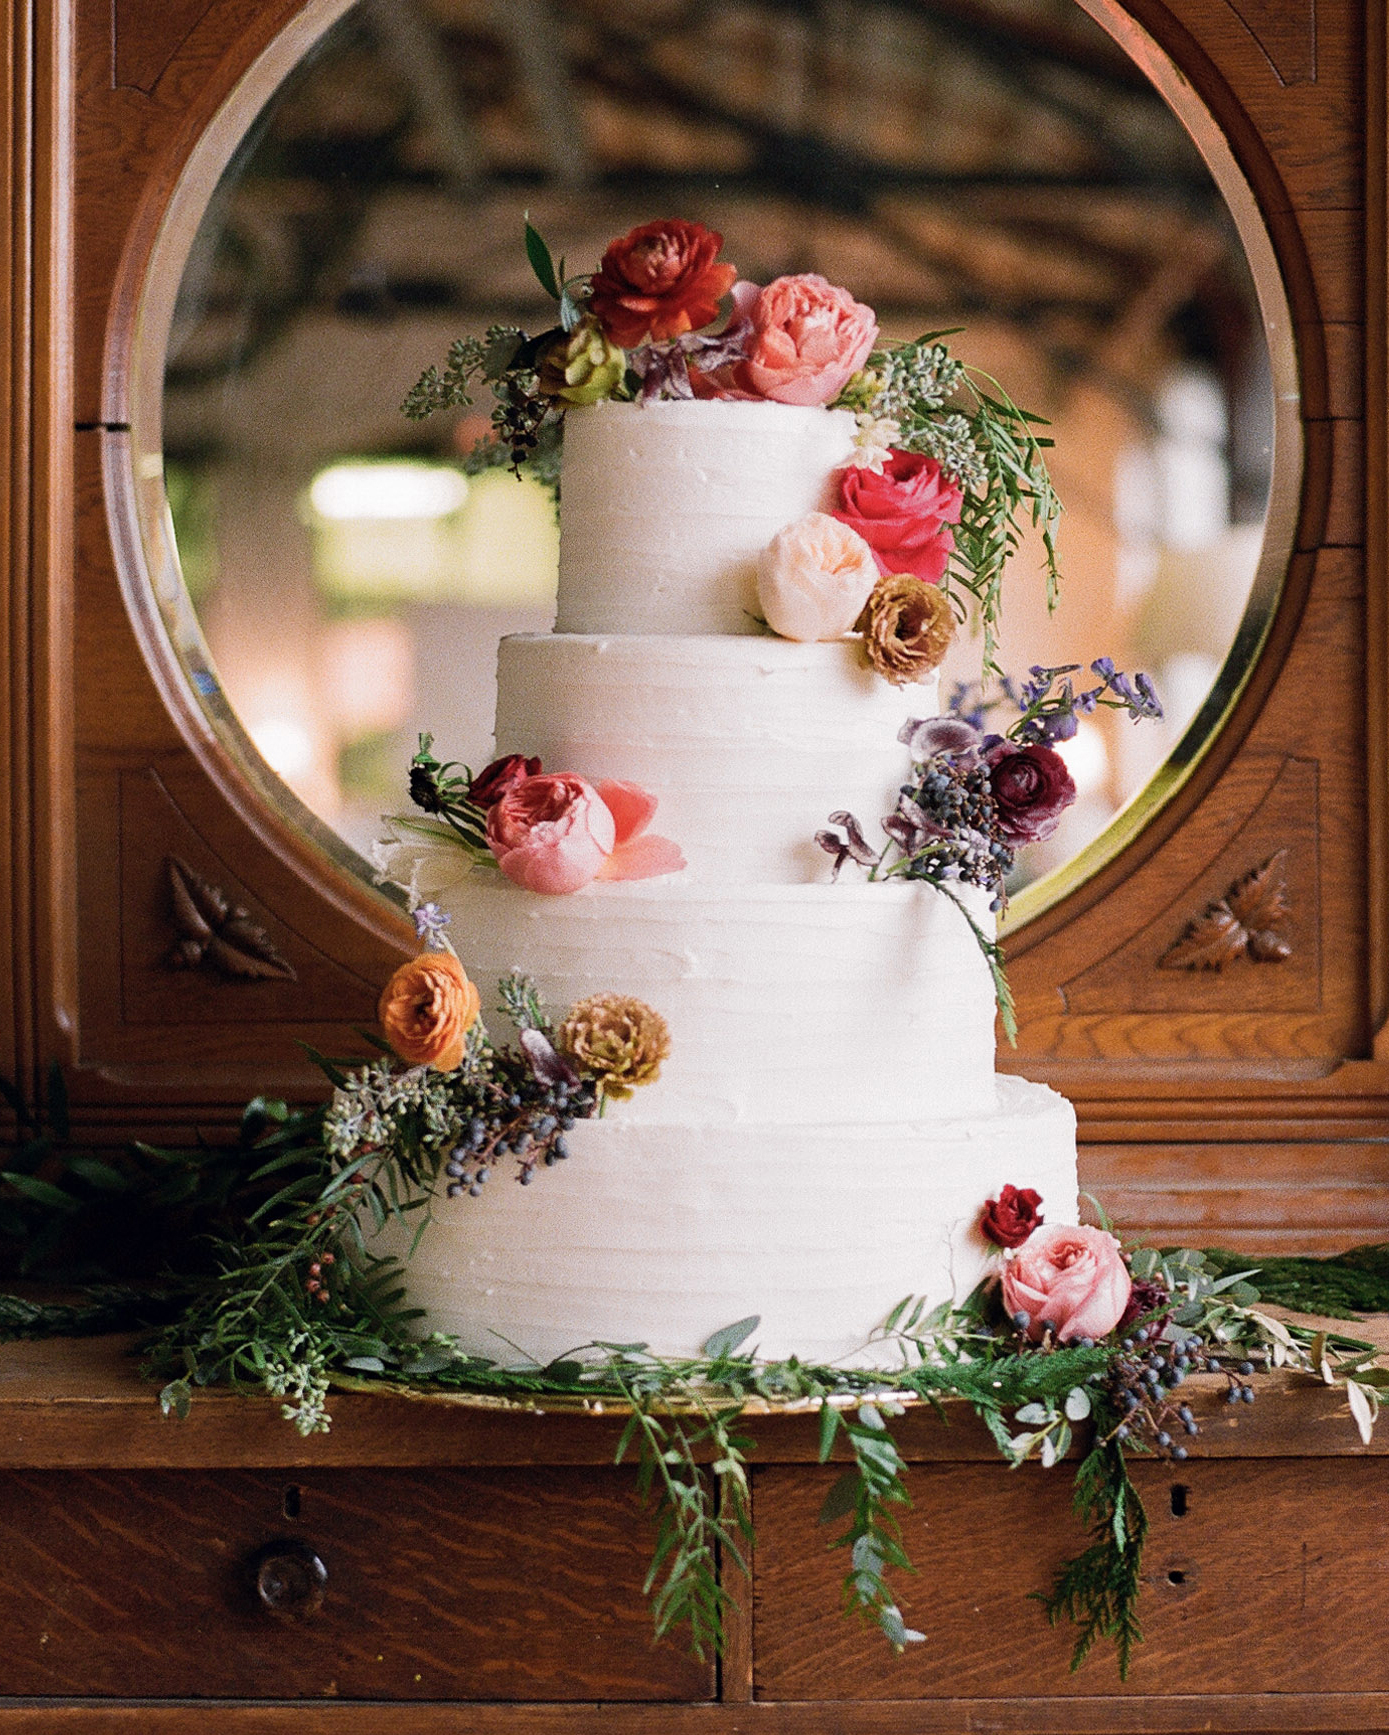 sidney-dane-wedding-cake-317-s112109-0815.jpg